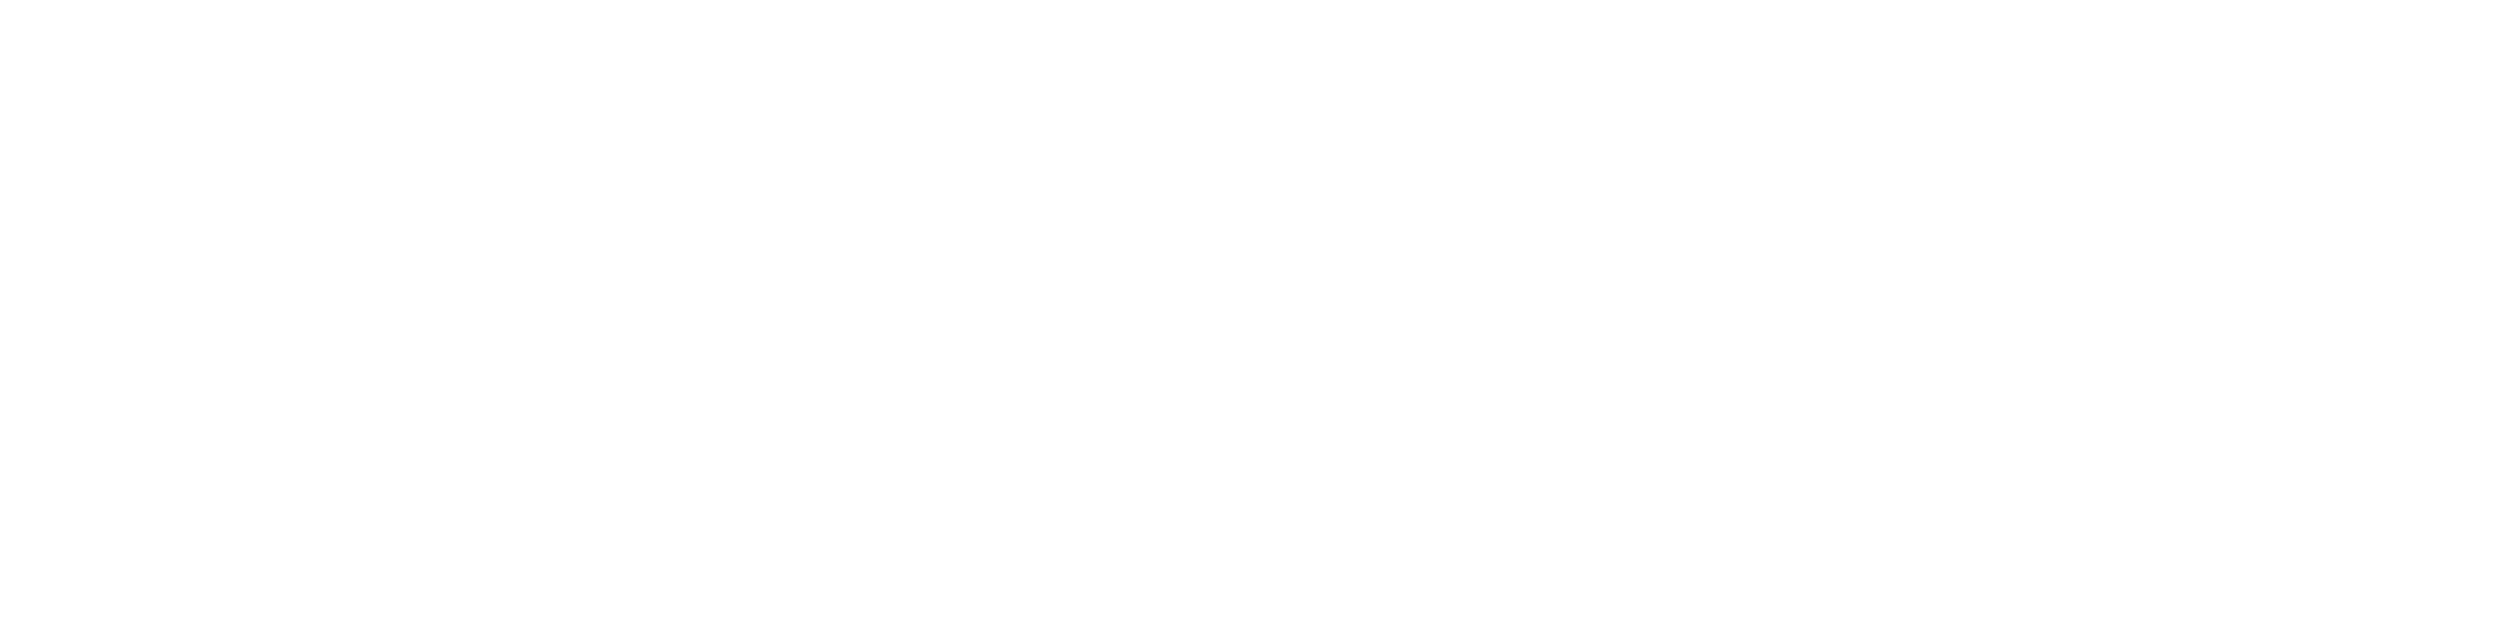 Lenni Torgue - English